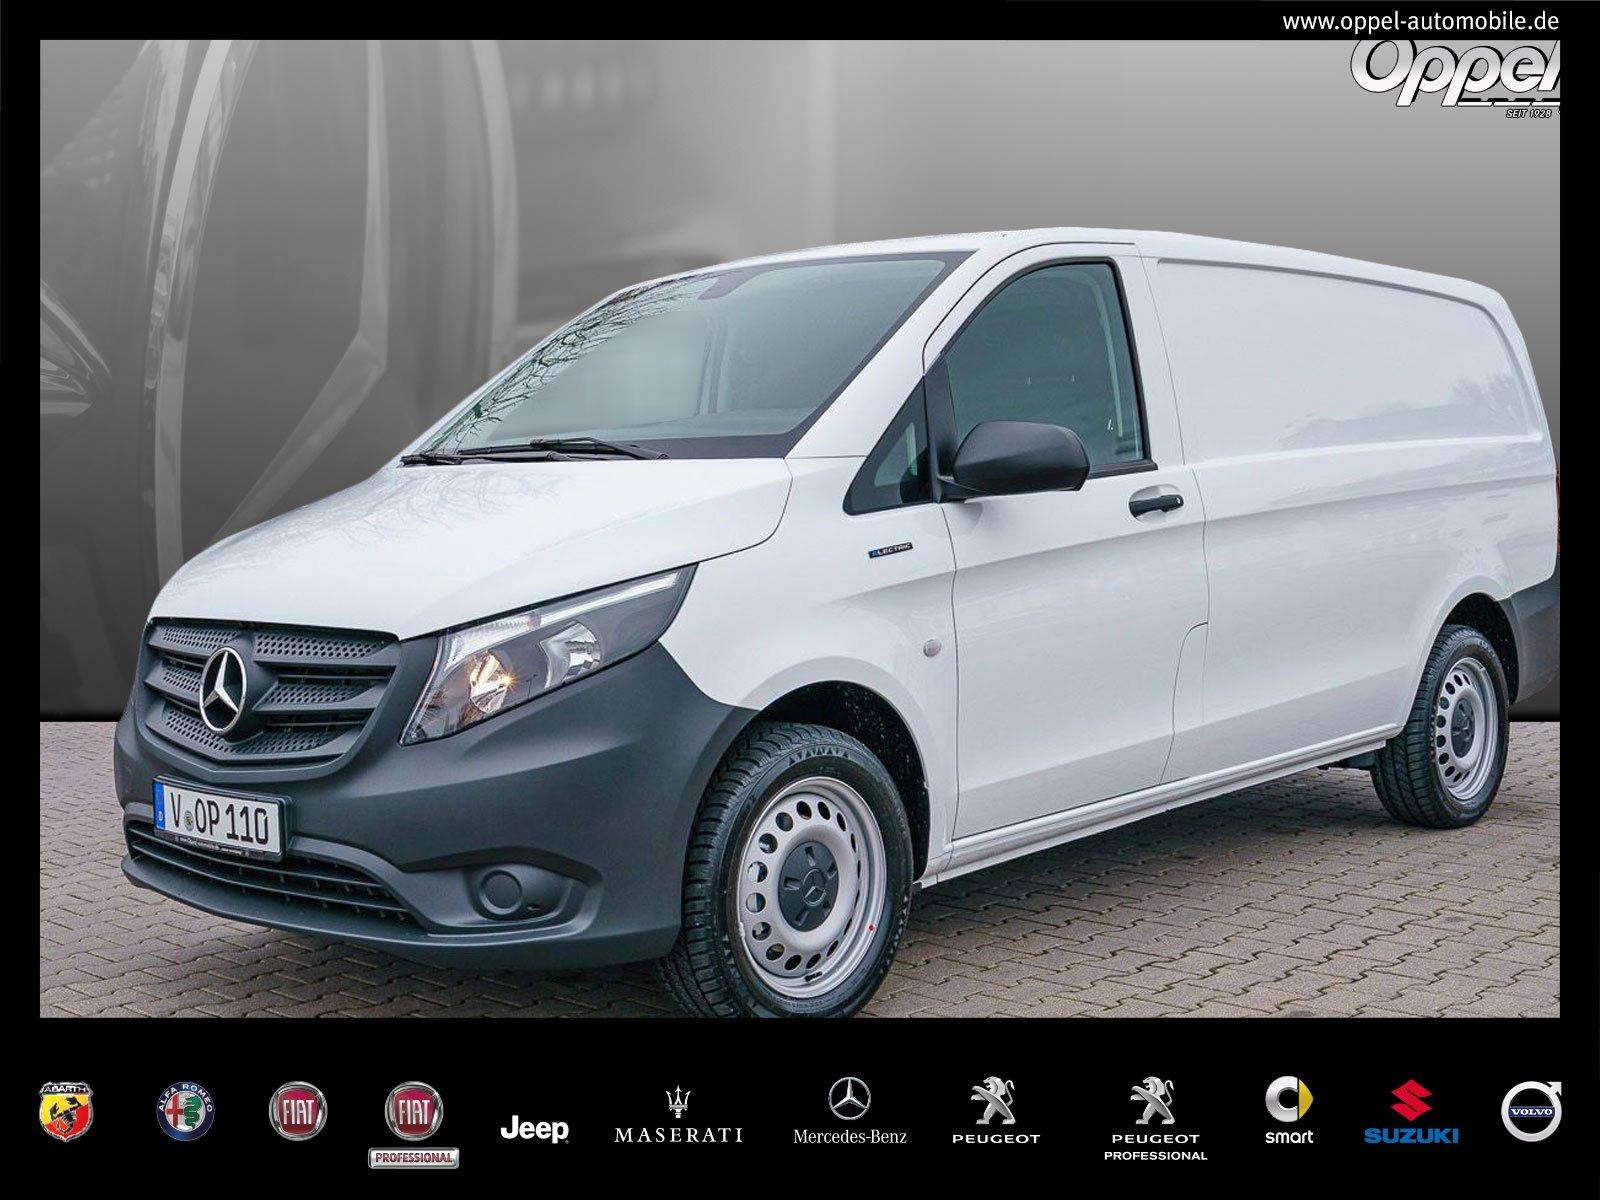 Mercedes-Benz eVito Kasten +KLIMA+SITZ-HZG+NAVI+RÜCKF.-KAMERA+, Jahr 2019, Elektro